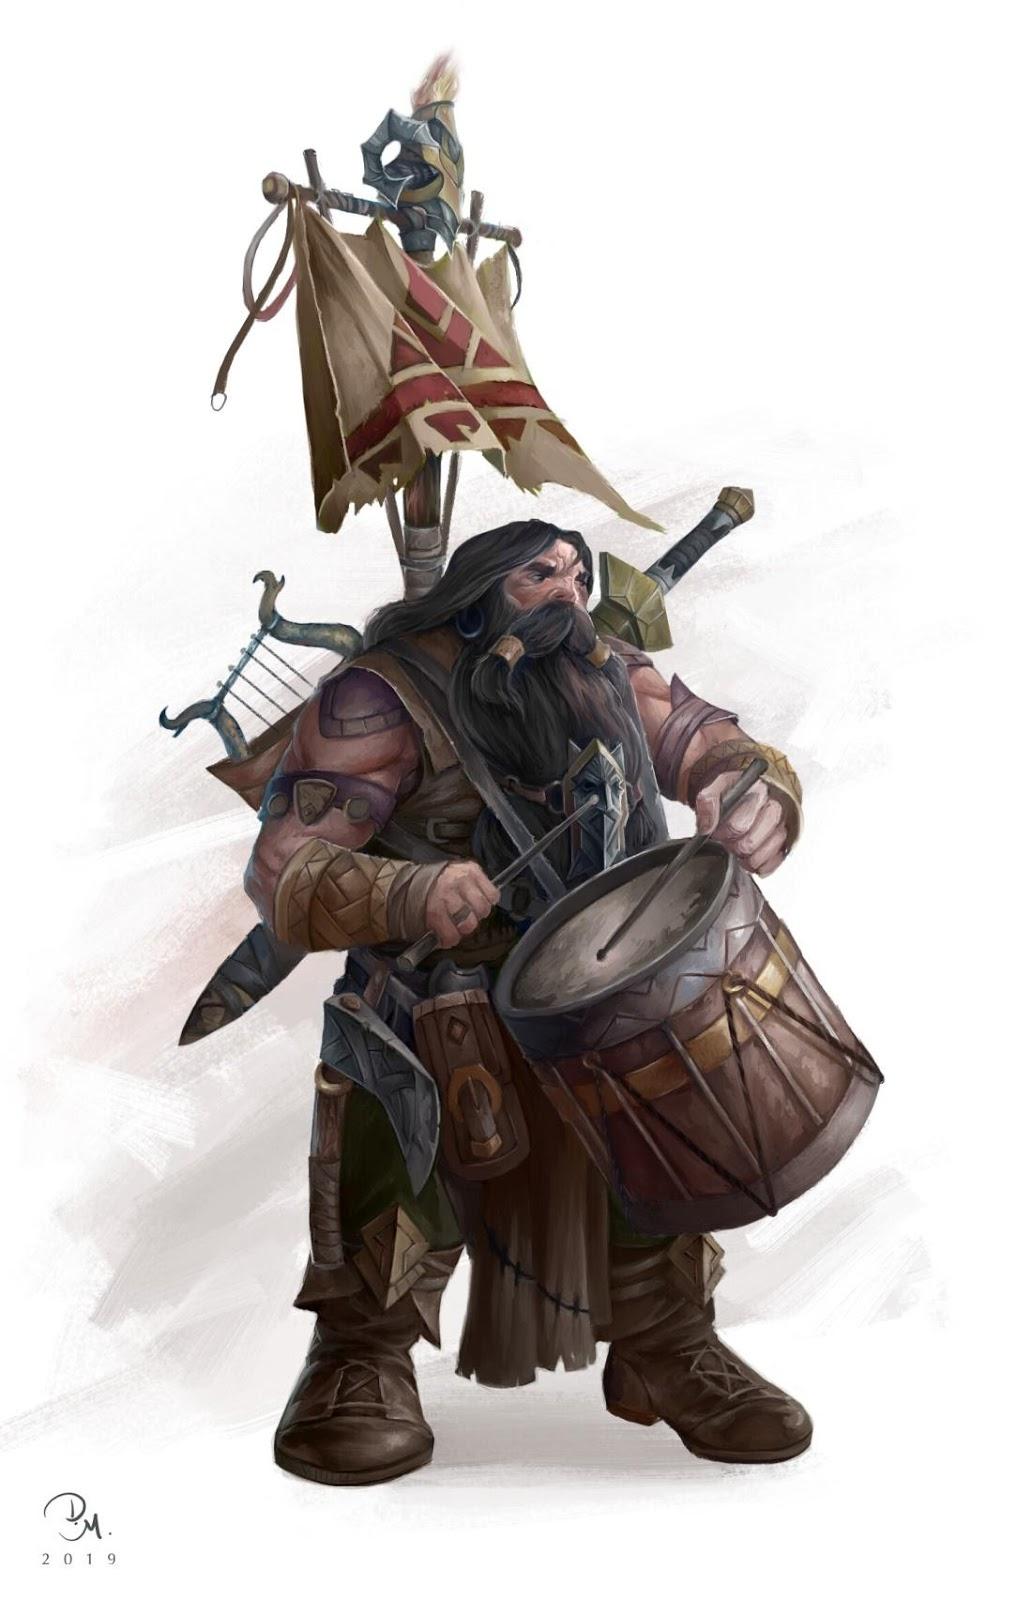 D&D 5e: Dwarf Bard Guide